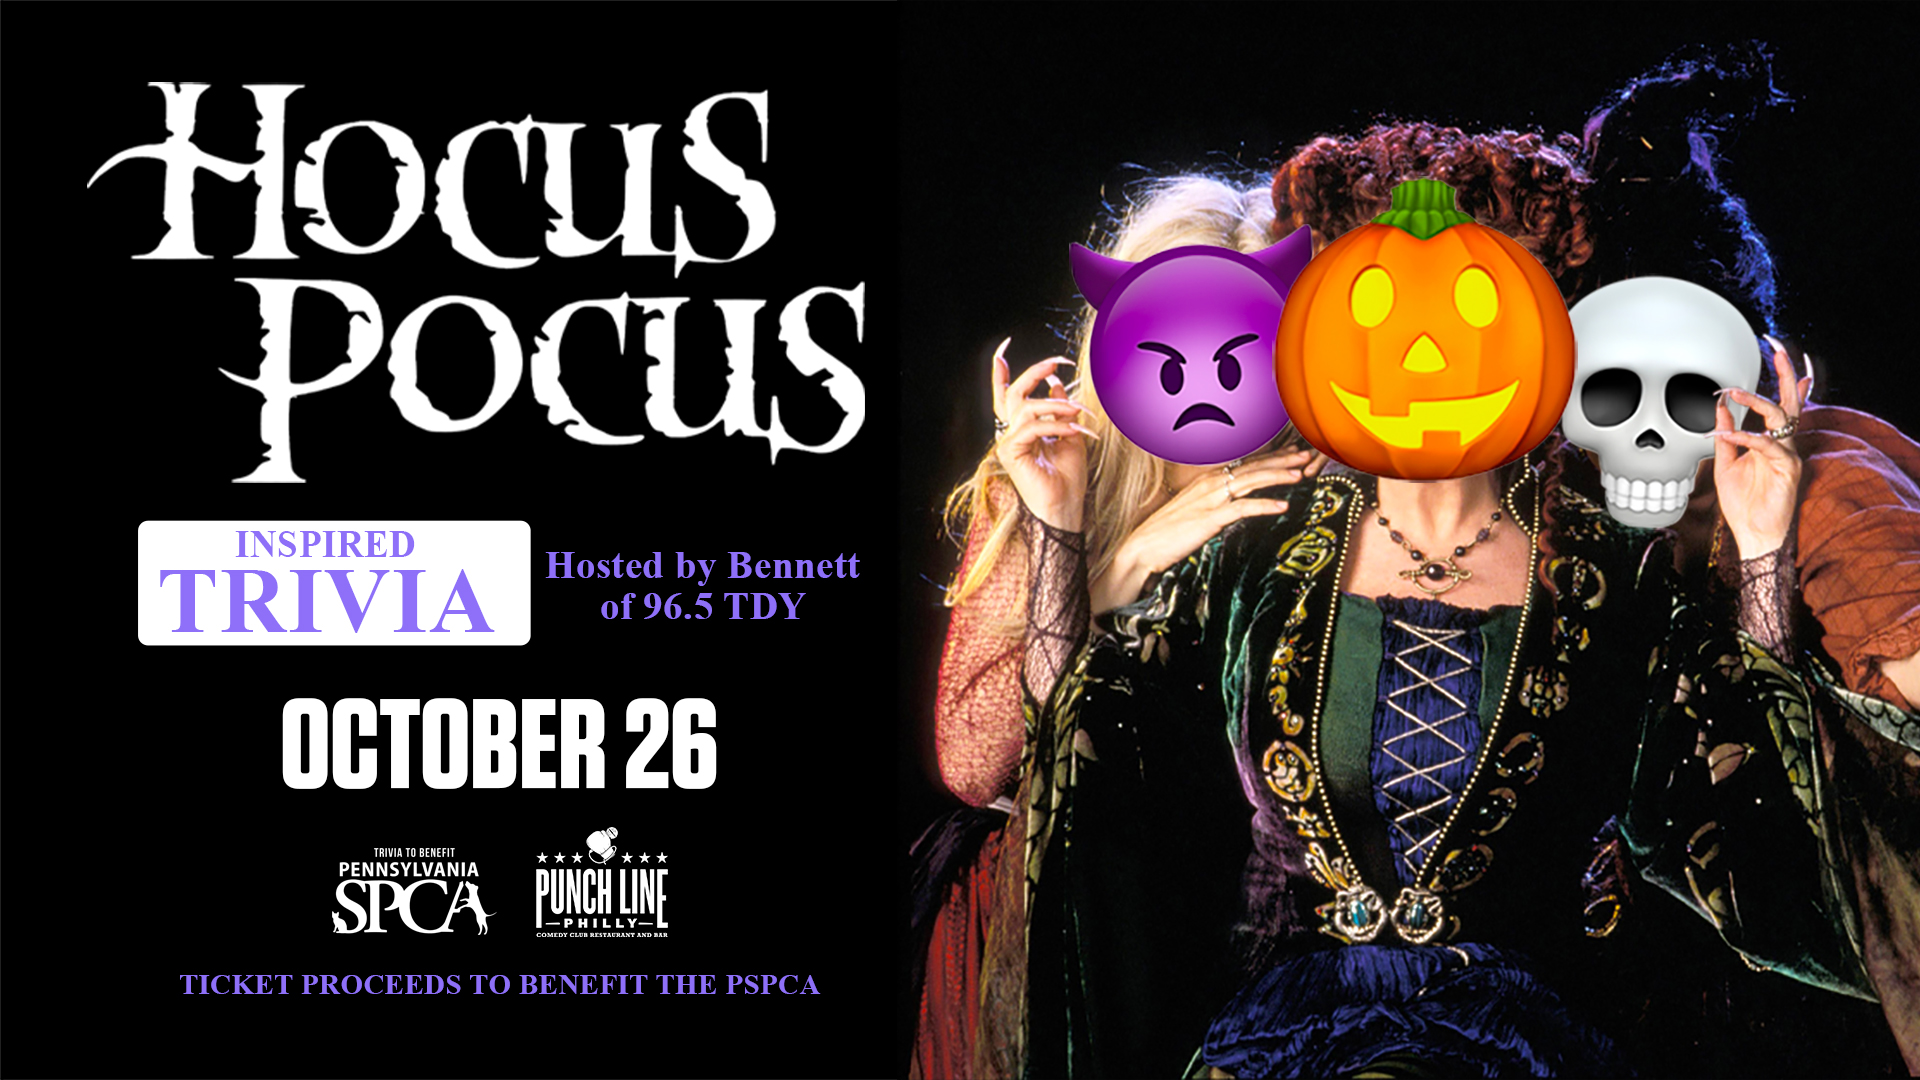 Hocus Pocus Trivia To Benefit The PSPCA